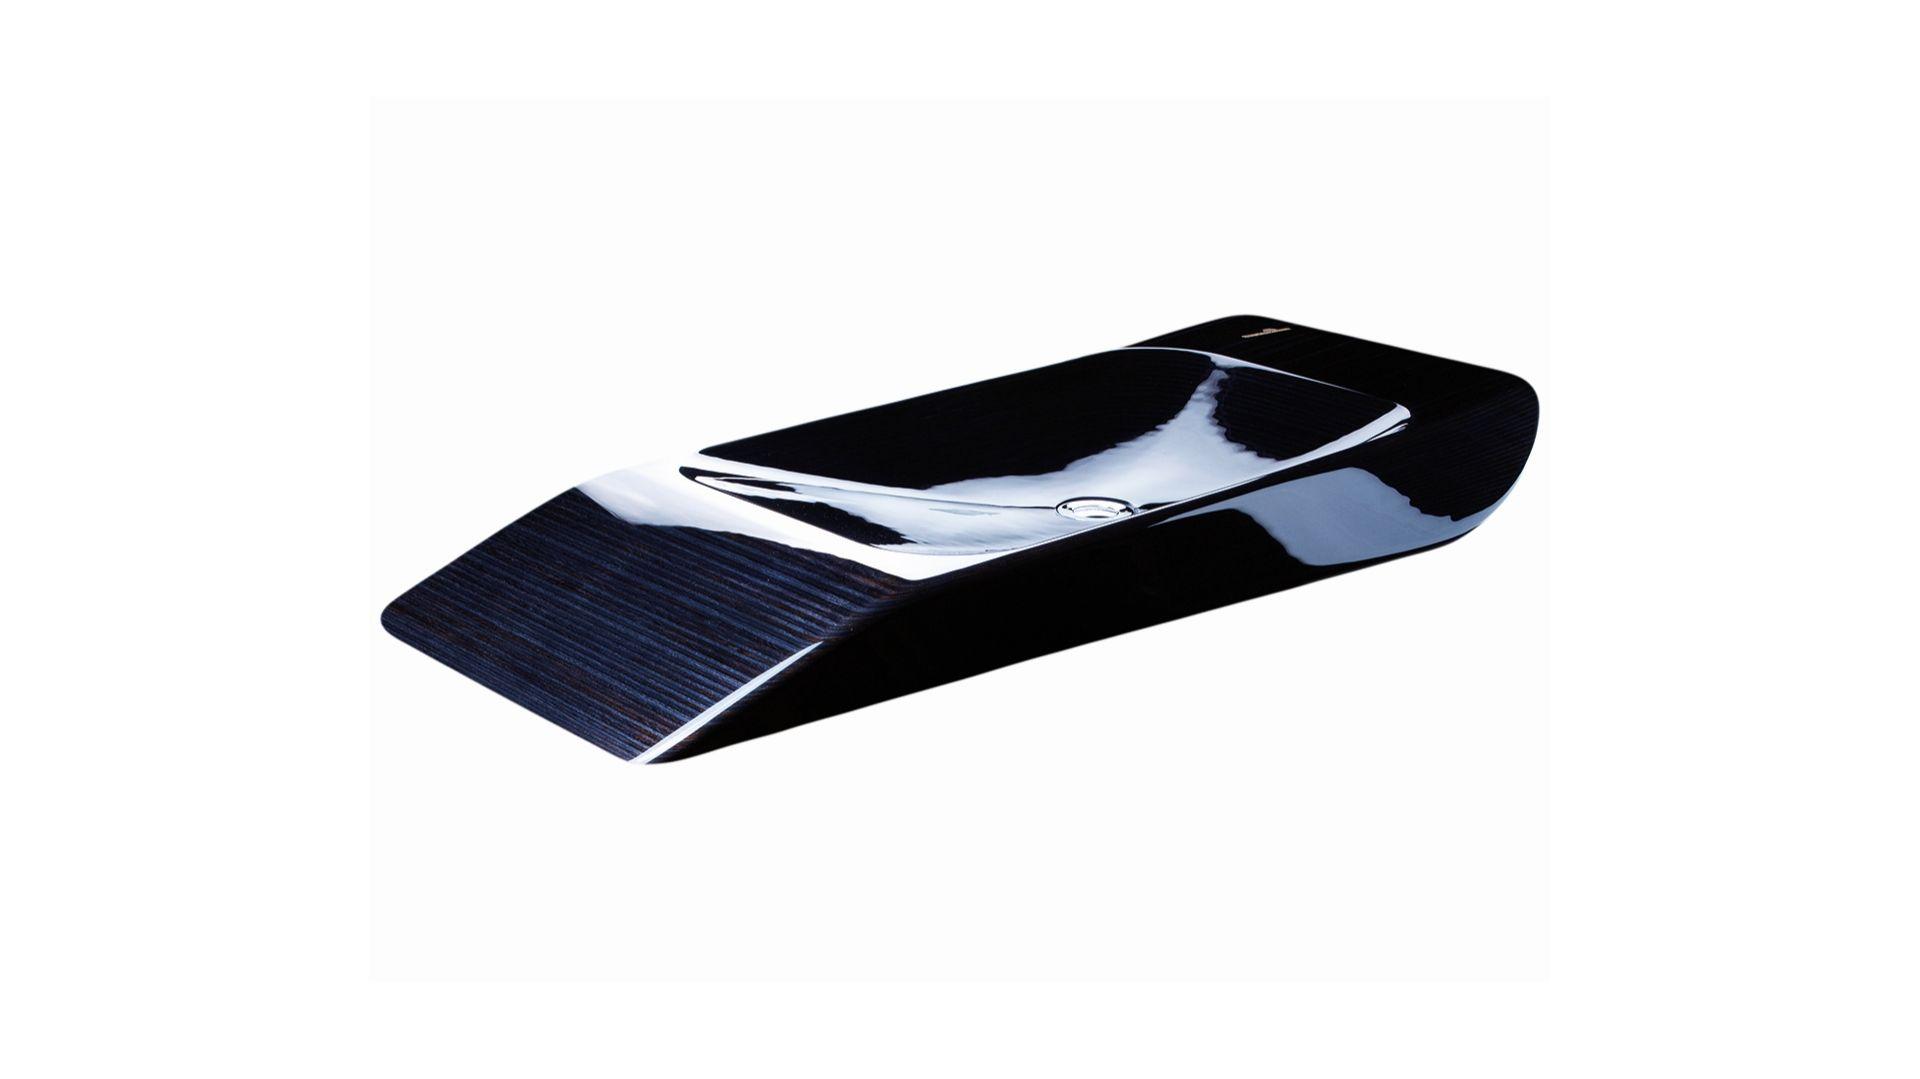 Delta/Szkilnik Design. Produkt zgłoszony do konkursu Dobry Design 2019.